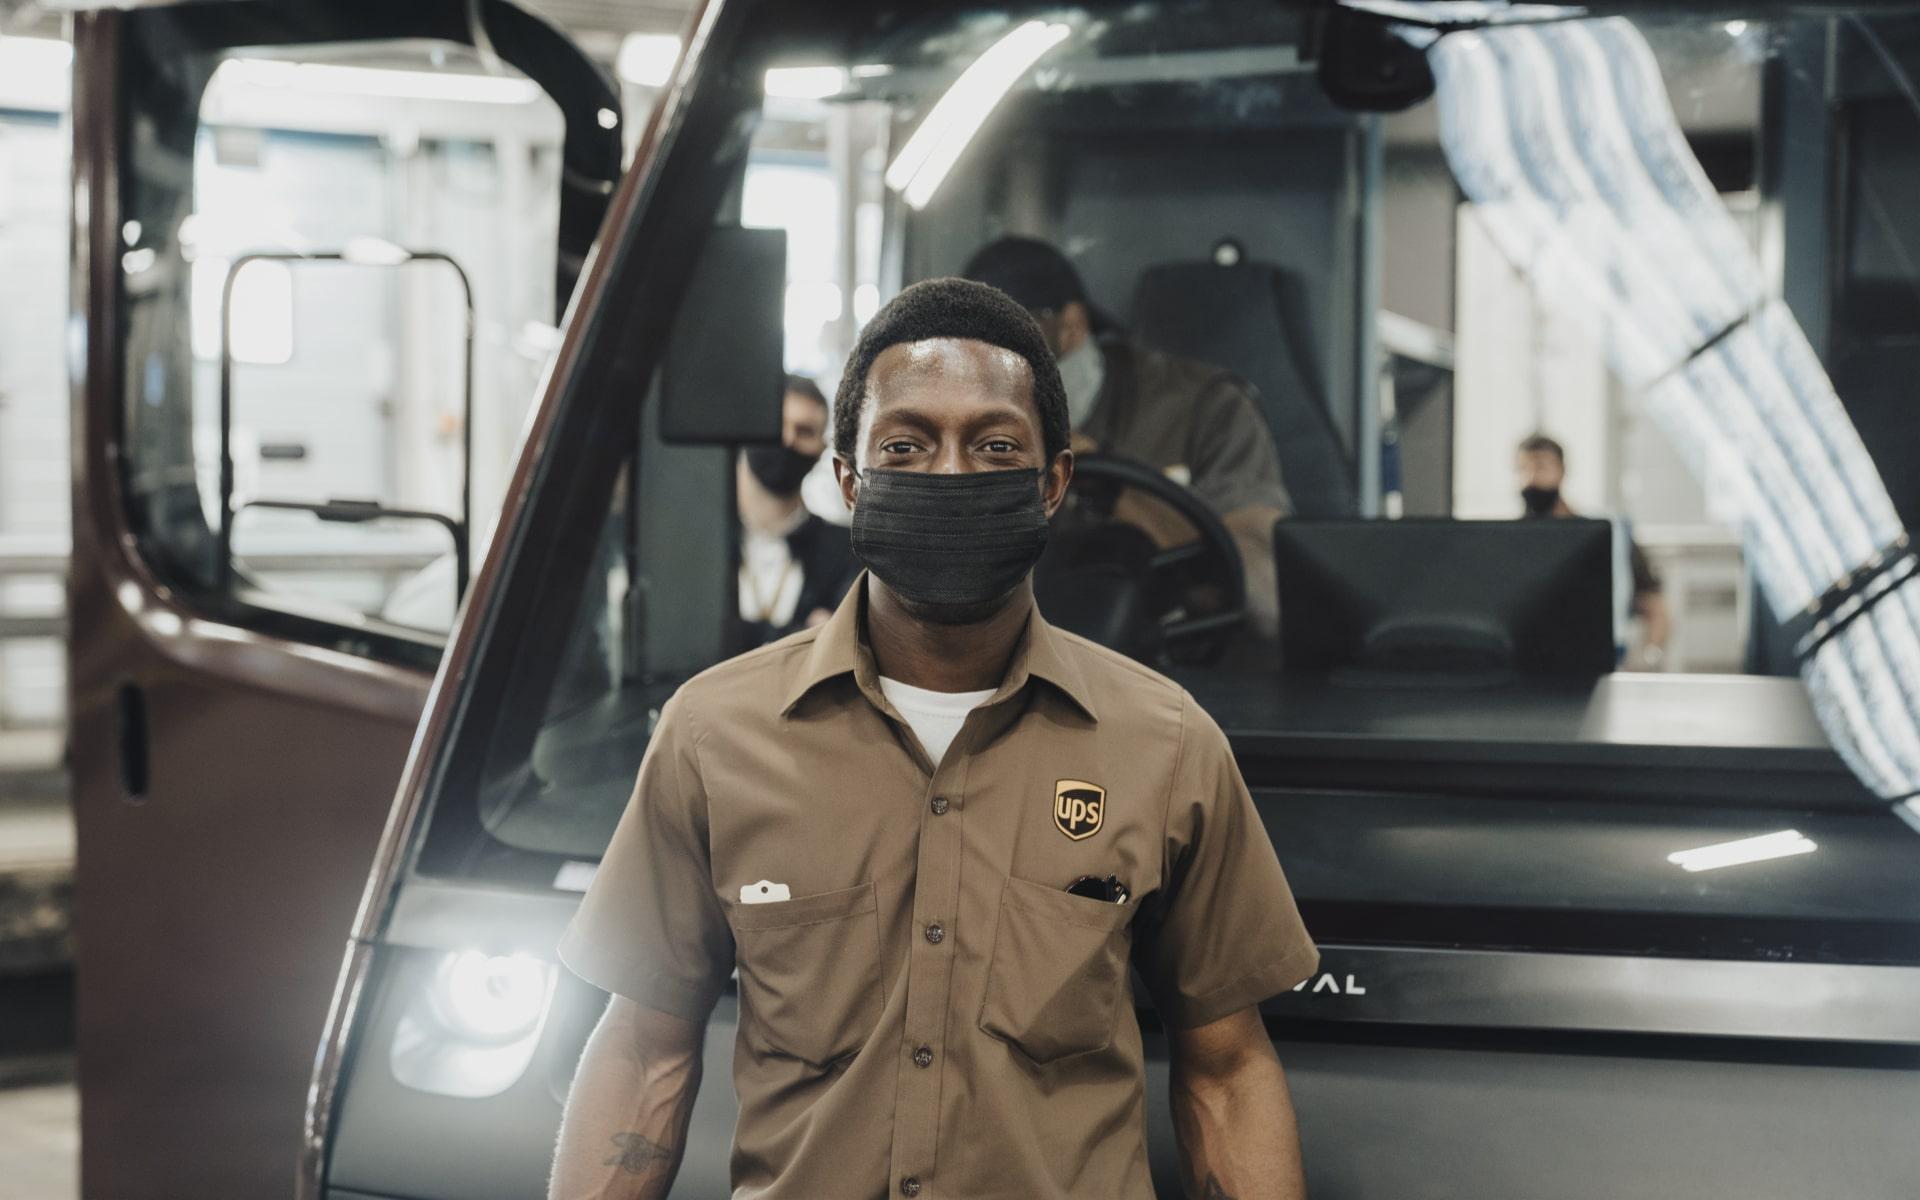 Van driver standing in front of Arrival vehicle